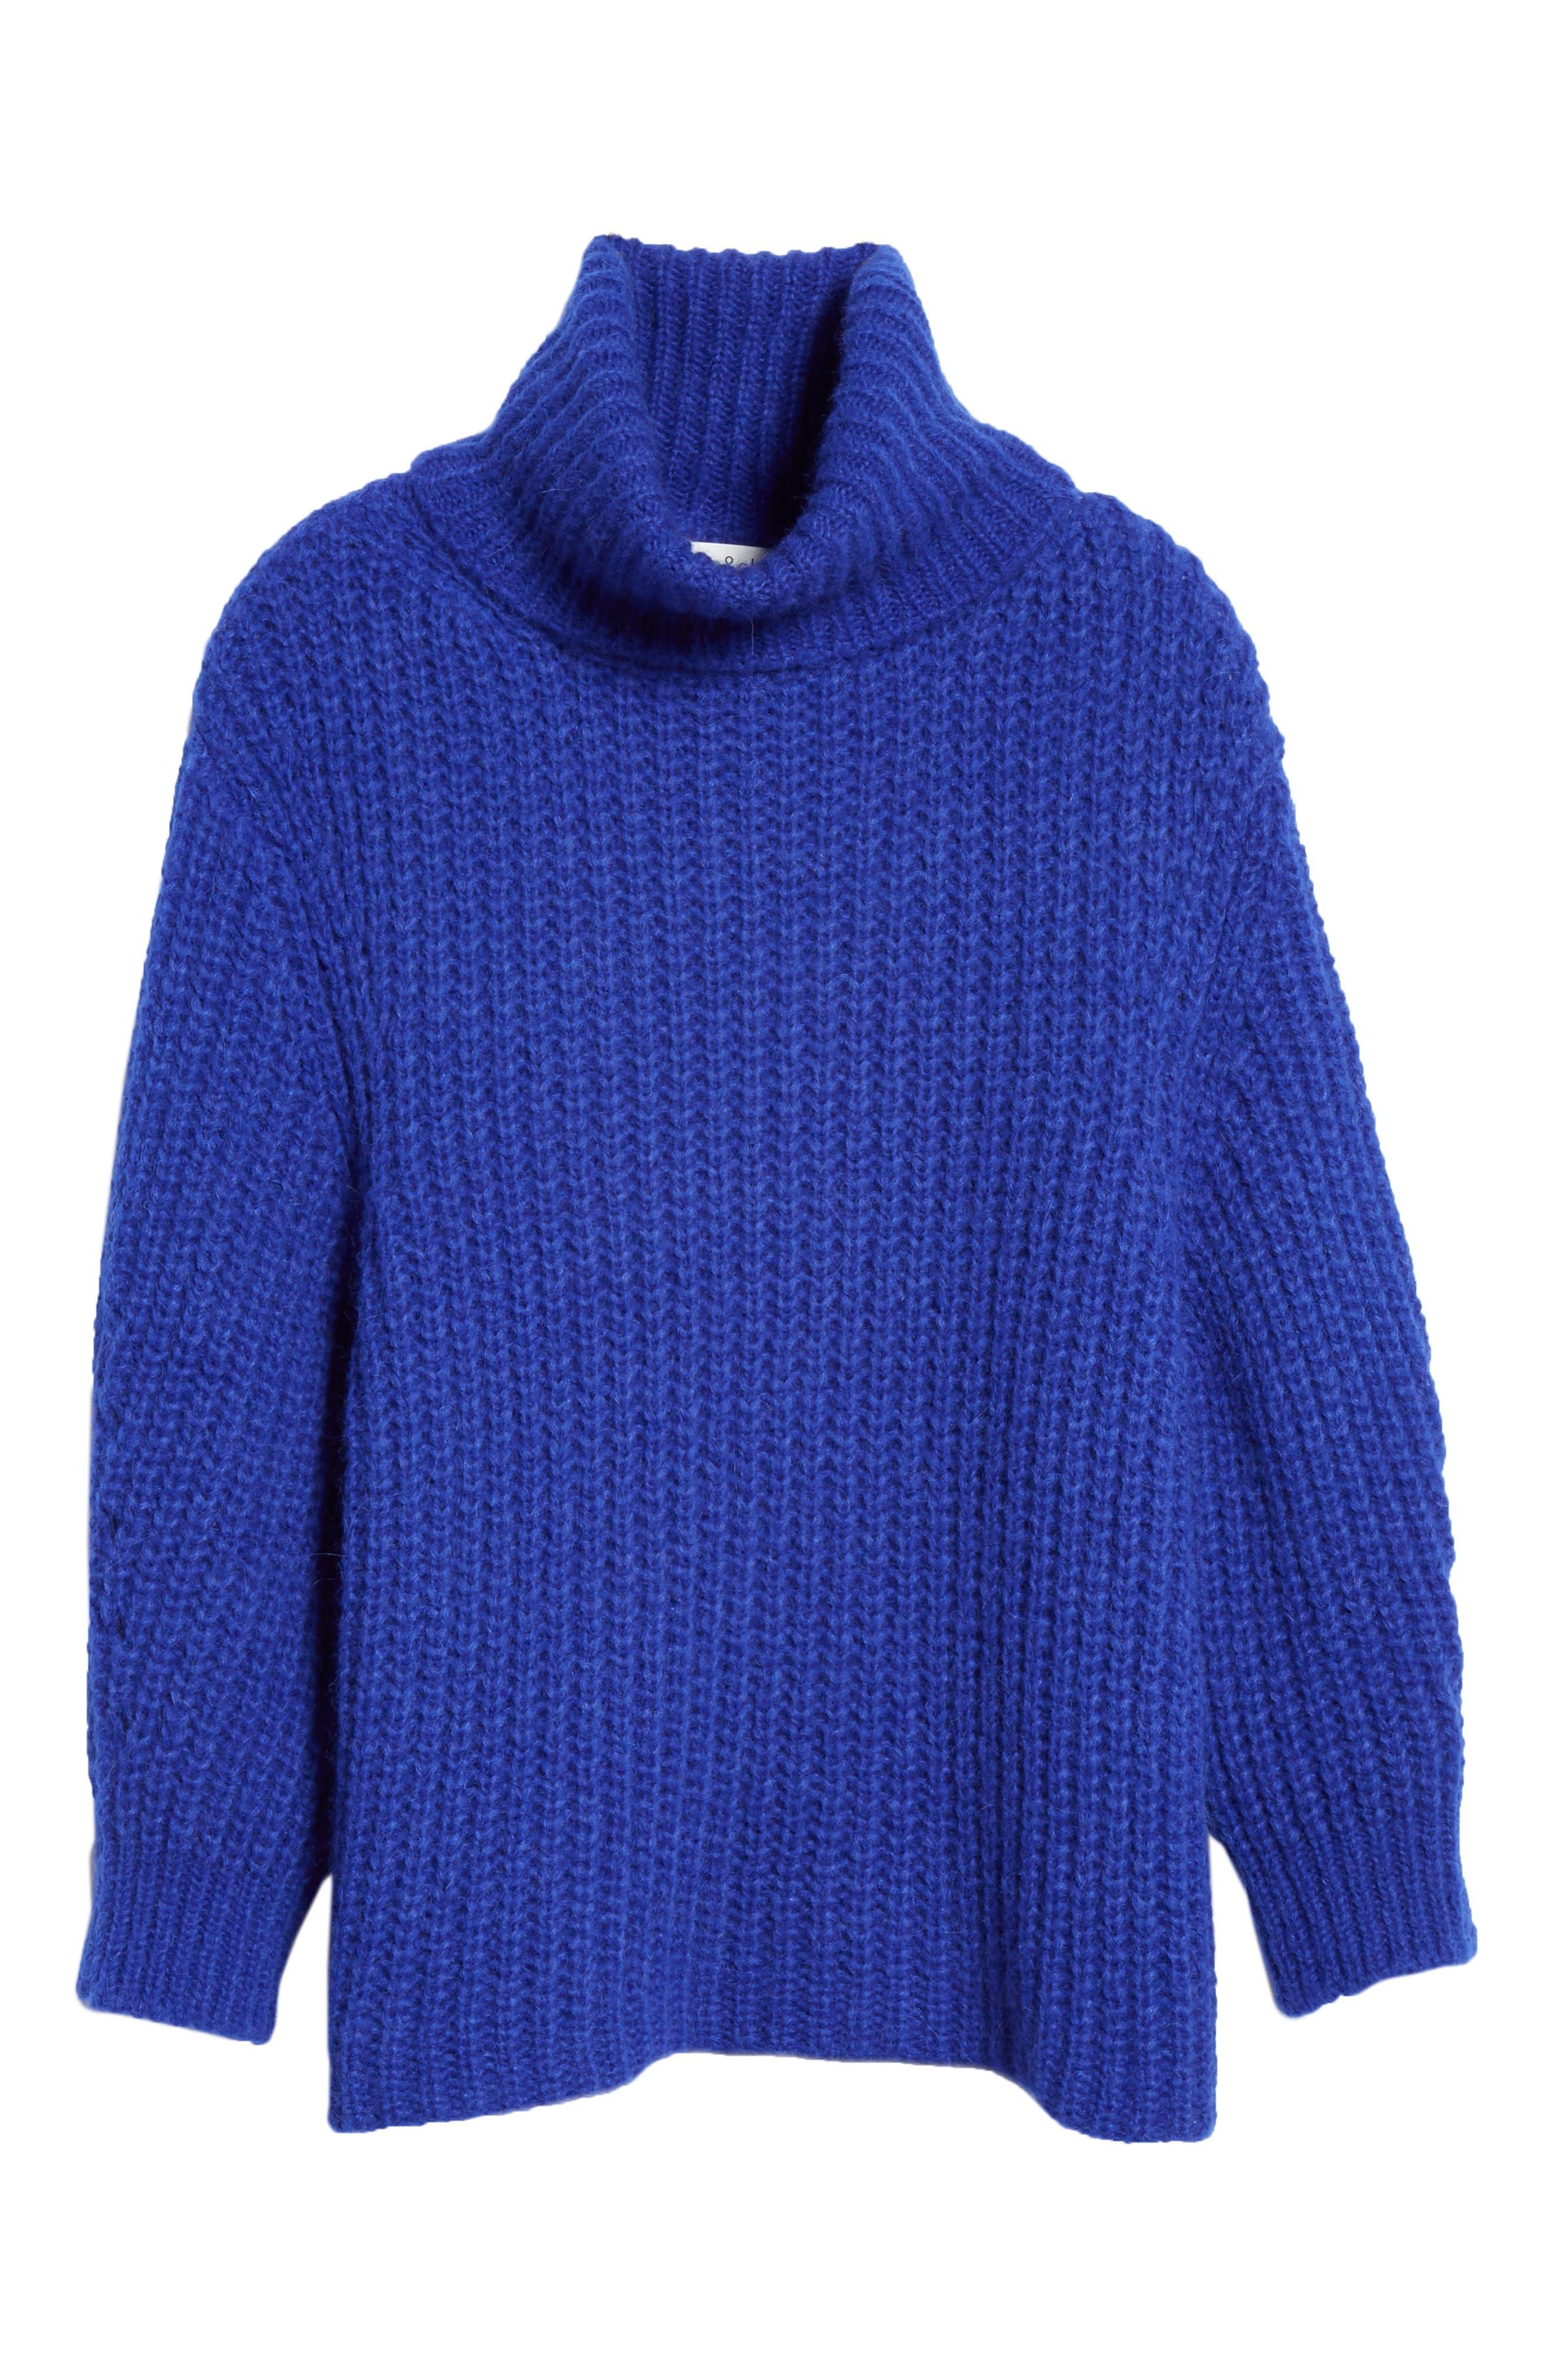 Emera Turtleneck Sweater,                             Alternate thumbnail 6, color,                             BLUE